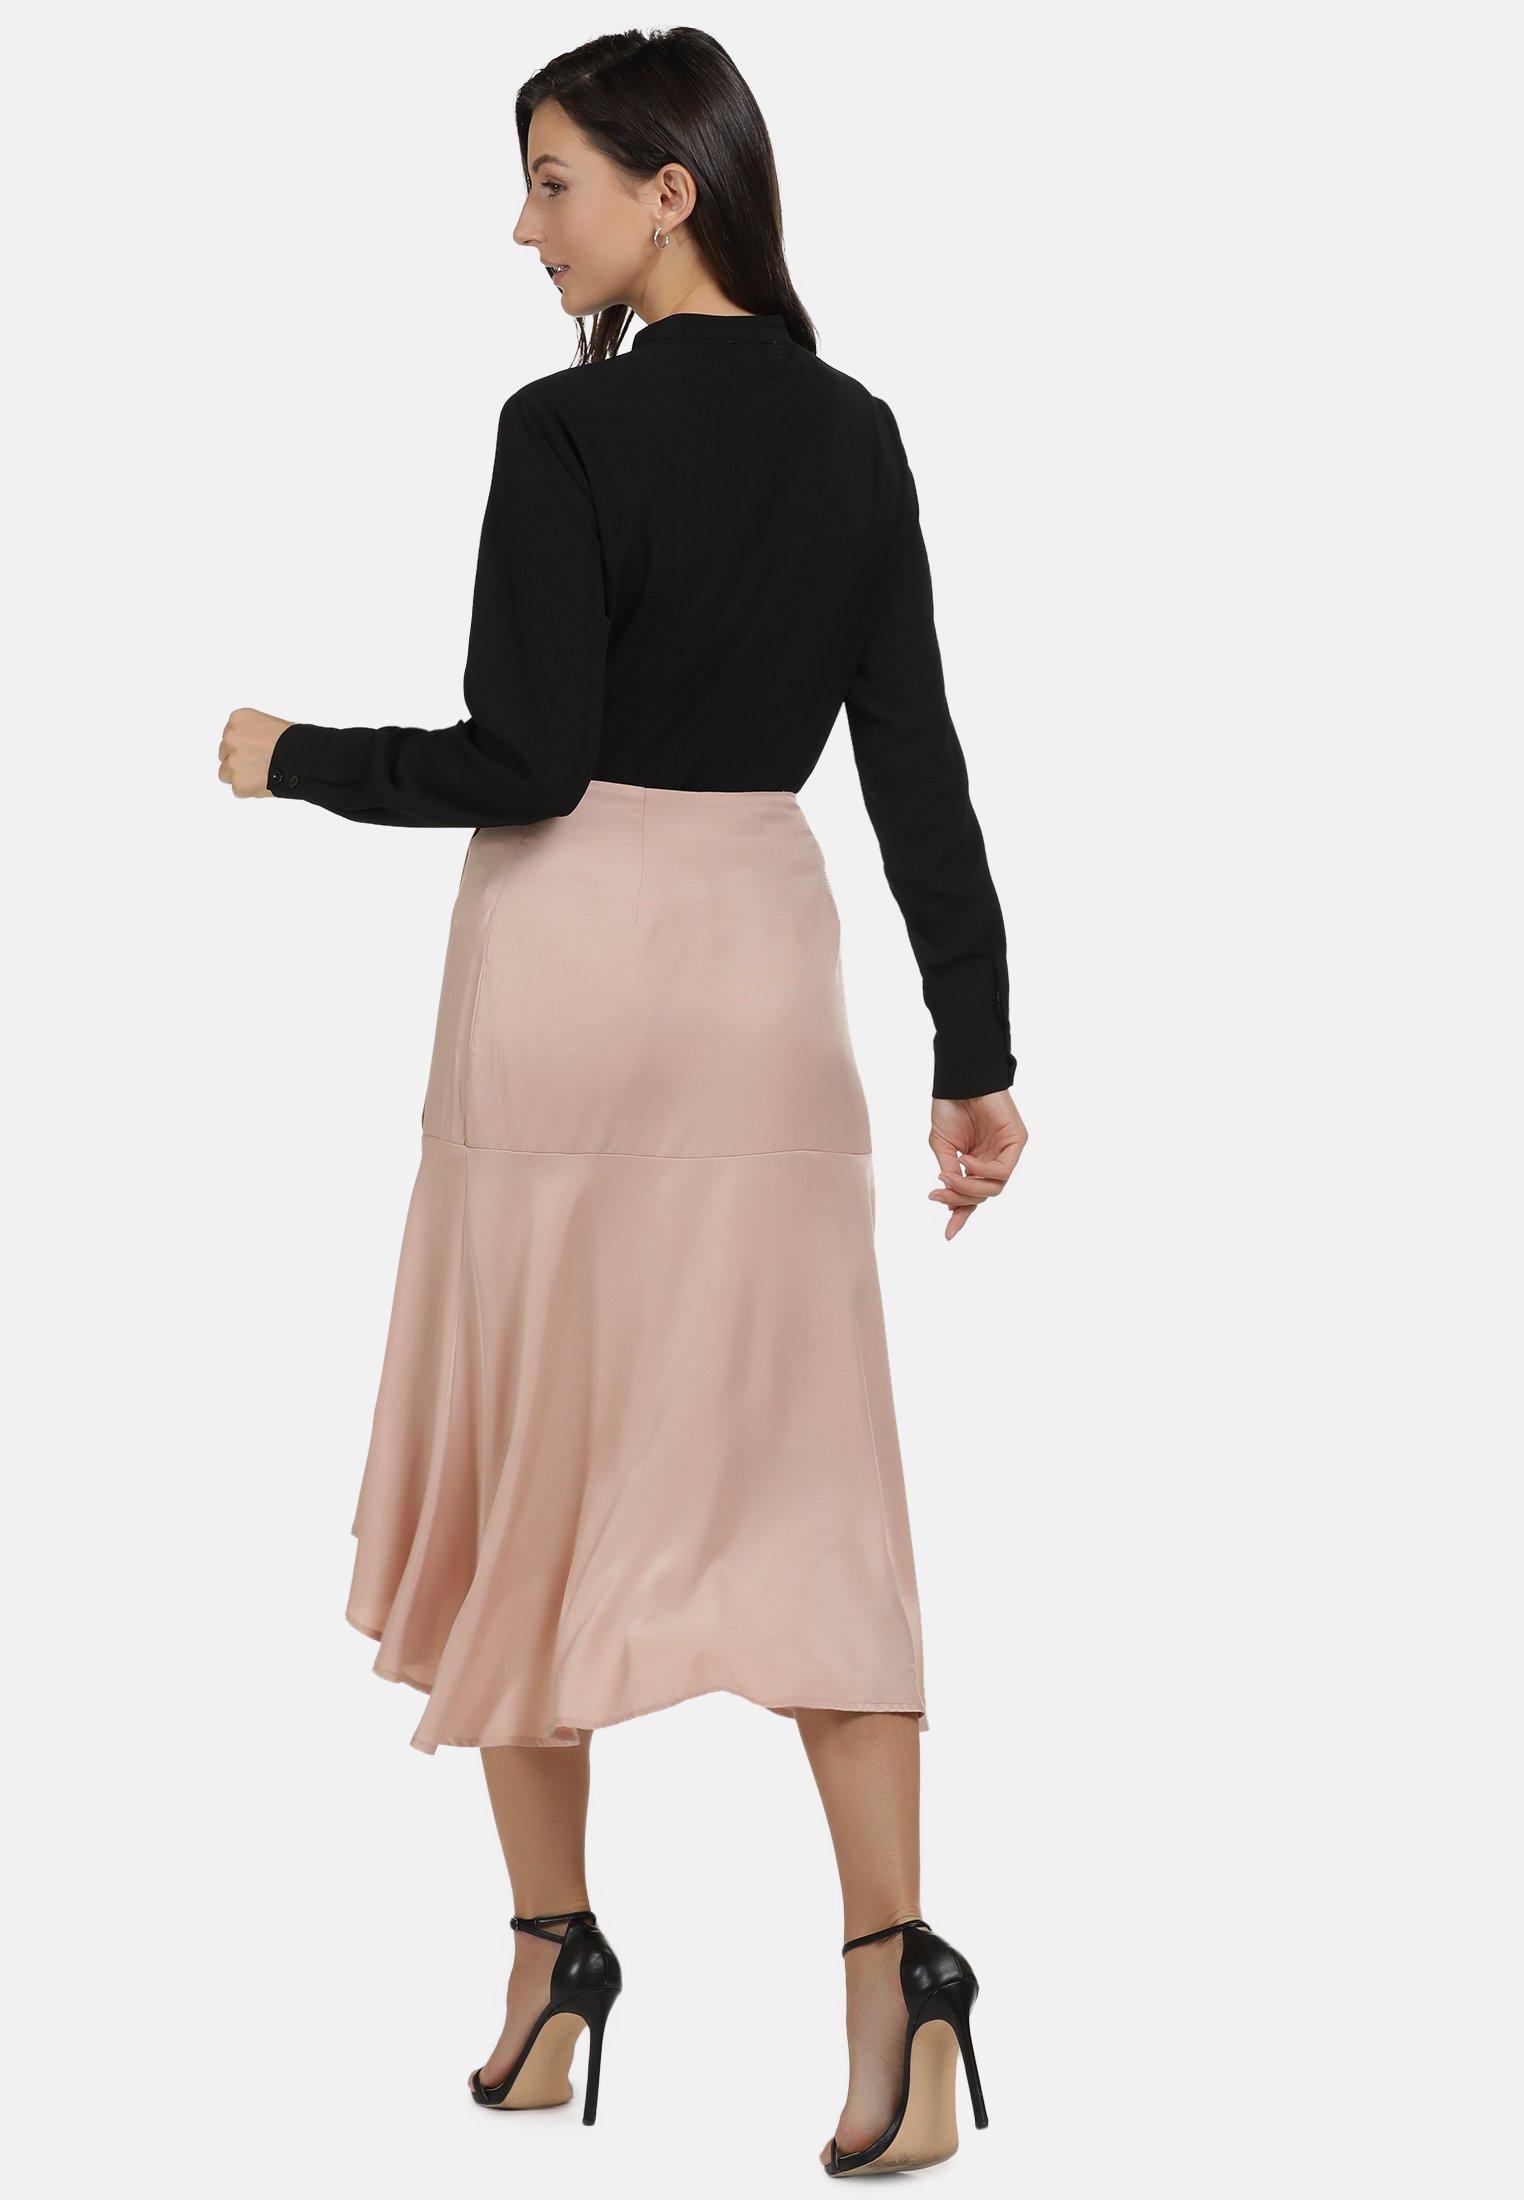 For Cheap Women's Clothing usha VOLANTROCK A-line skirt light pink 0XWHRBqEp